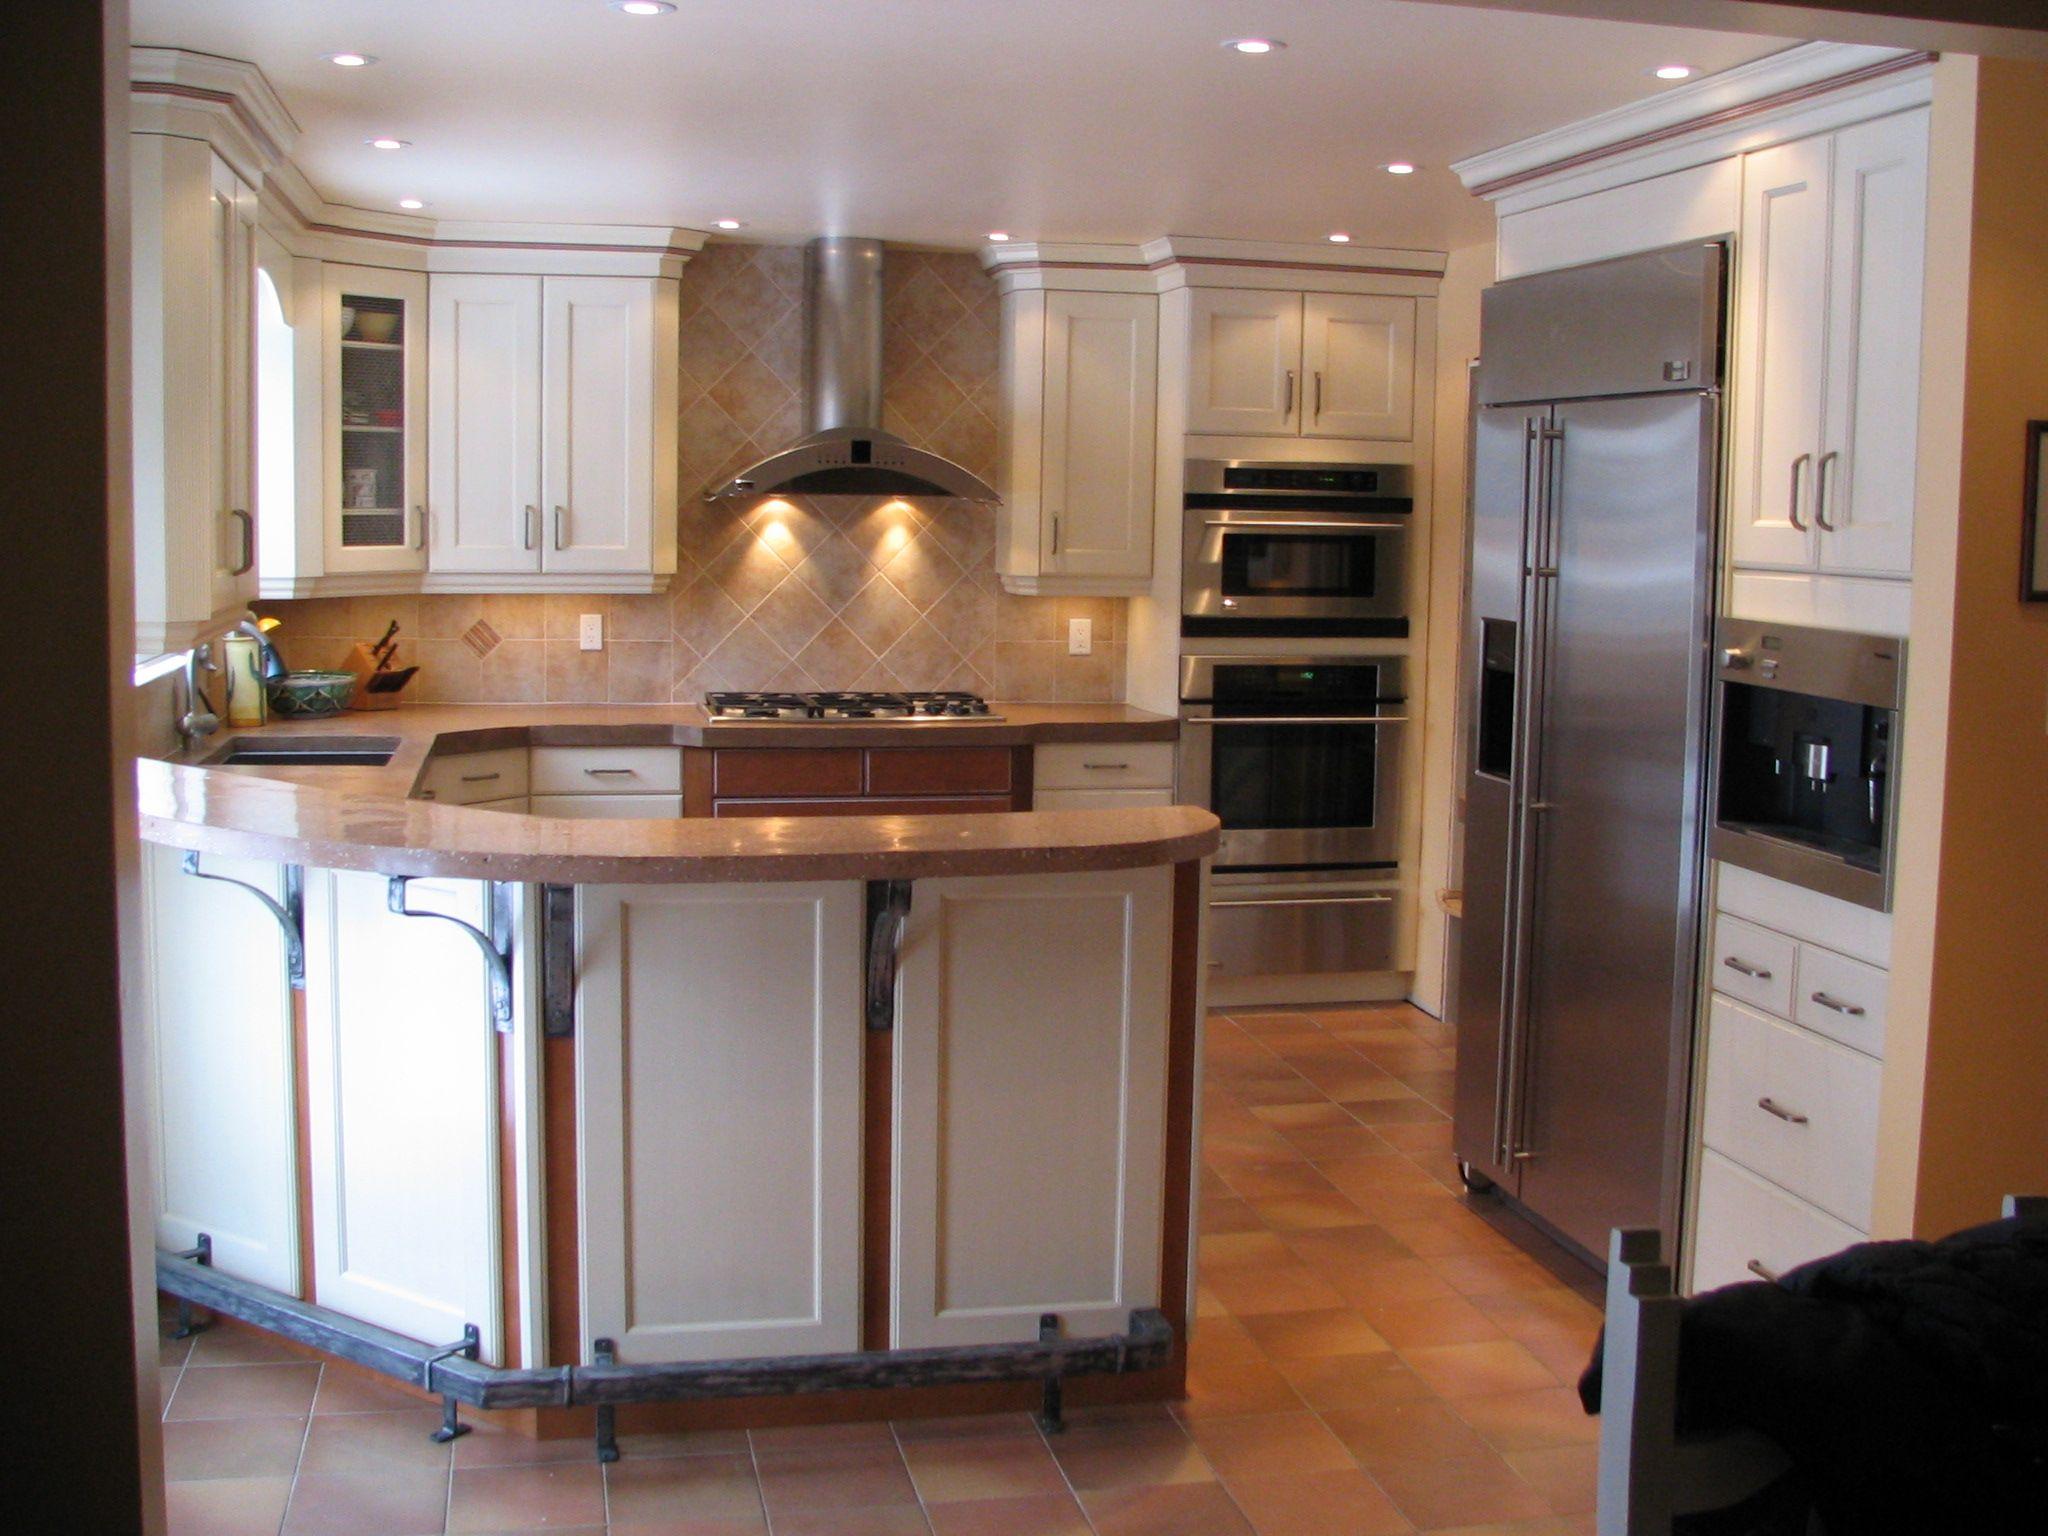 Southwest Motif Kitchen Glazed Antique White Lacquer